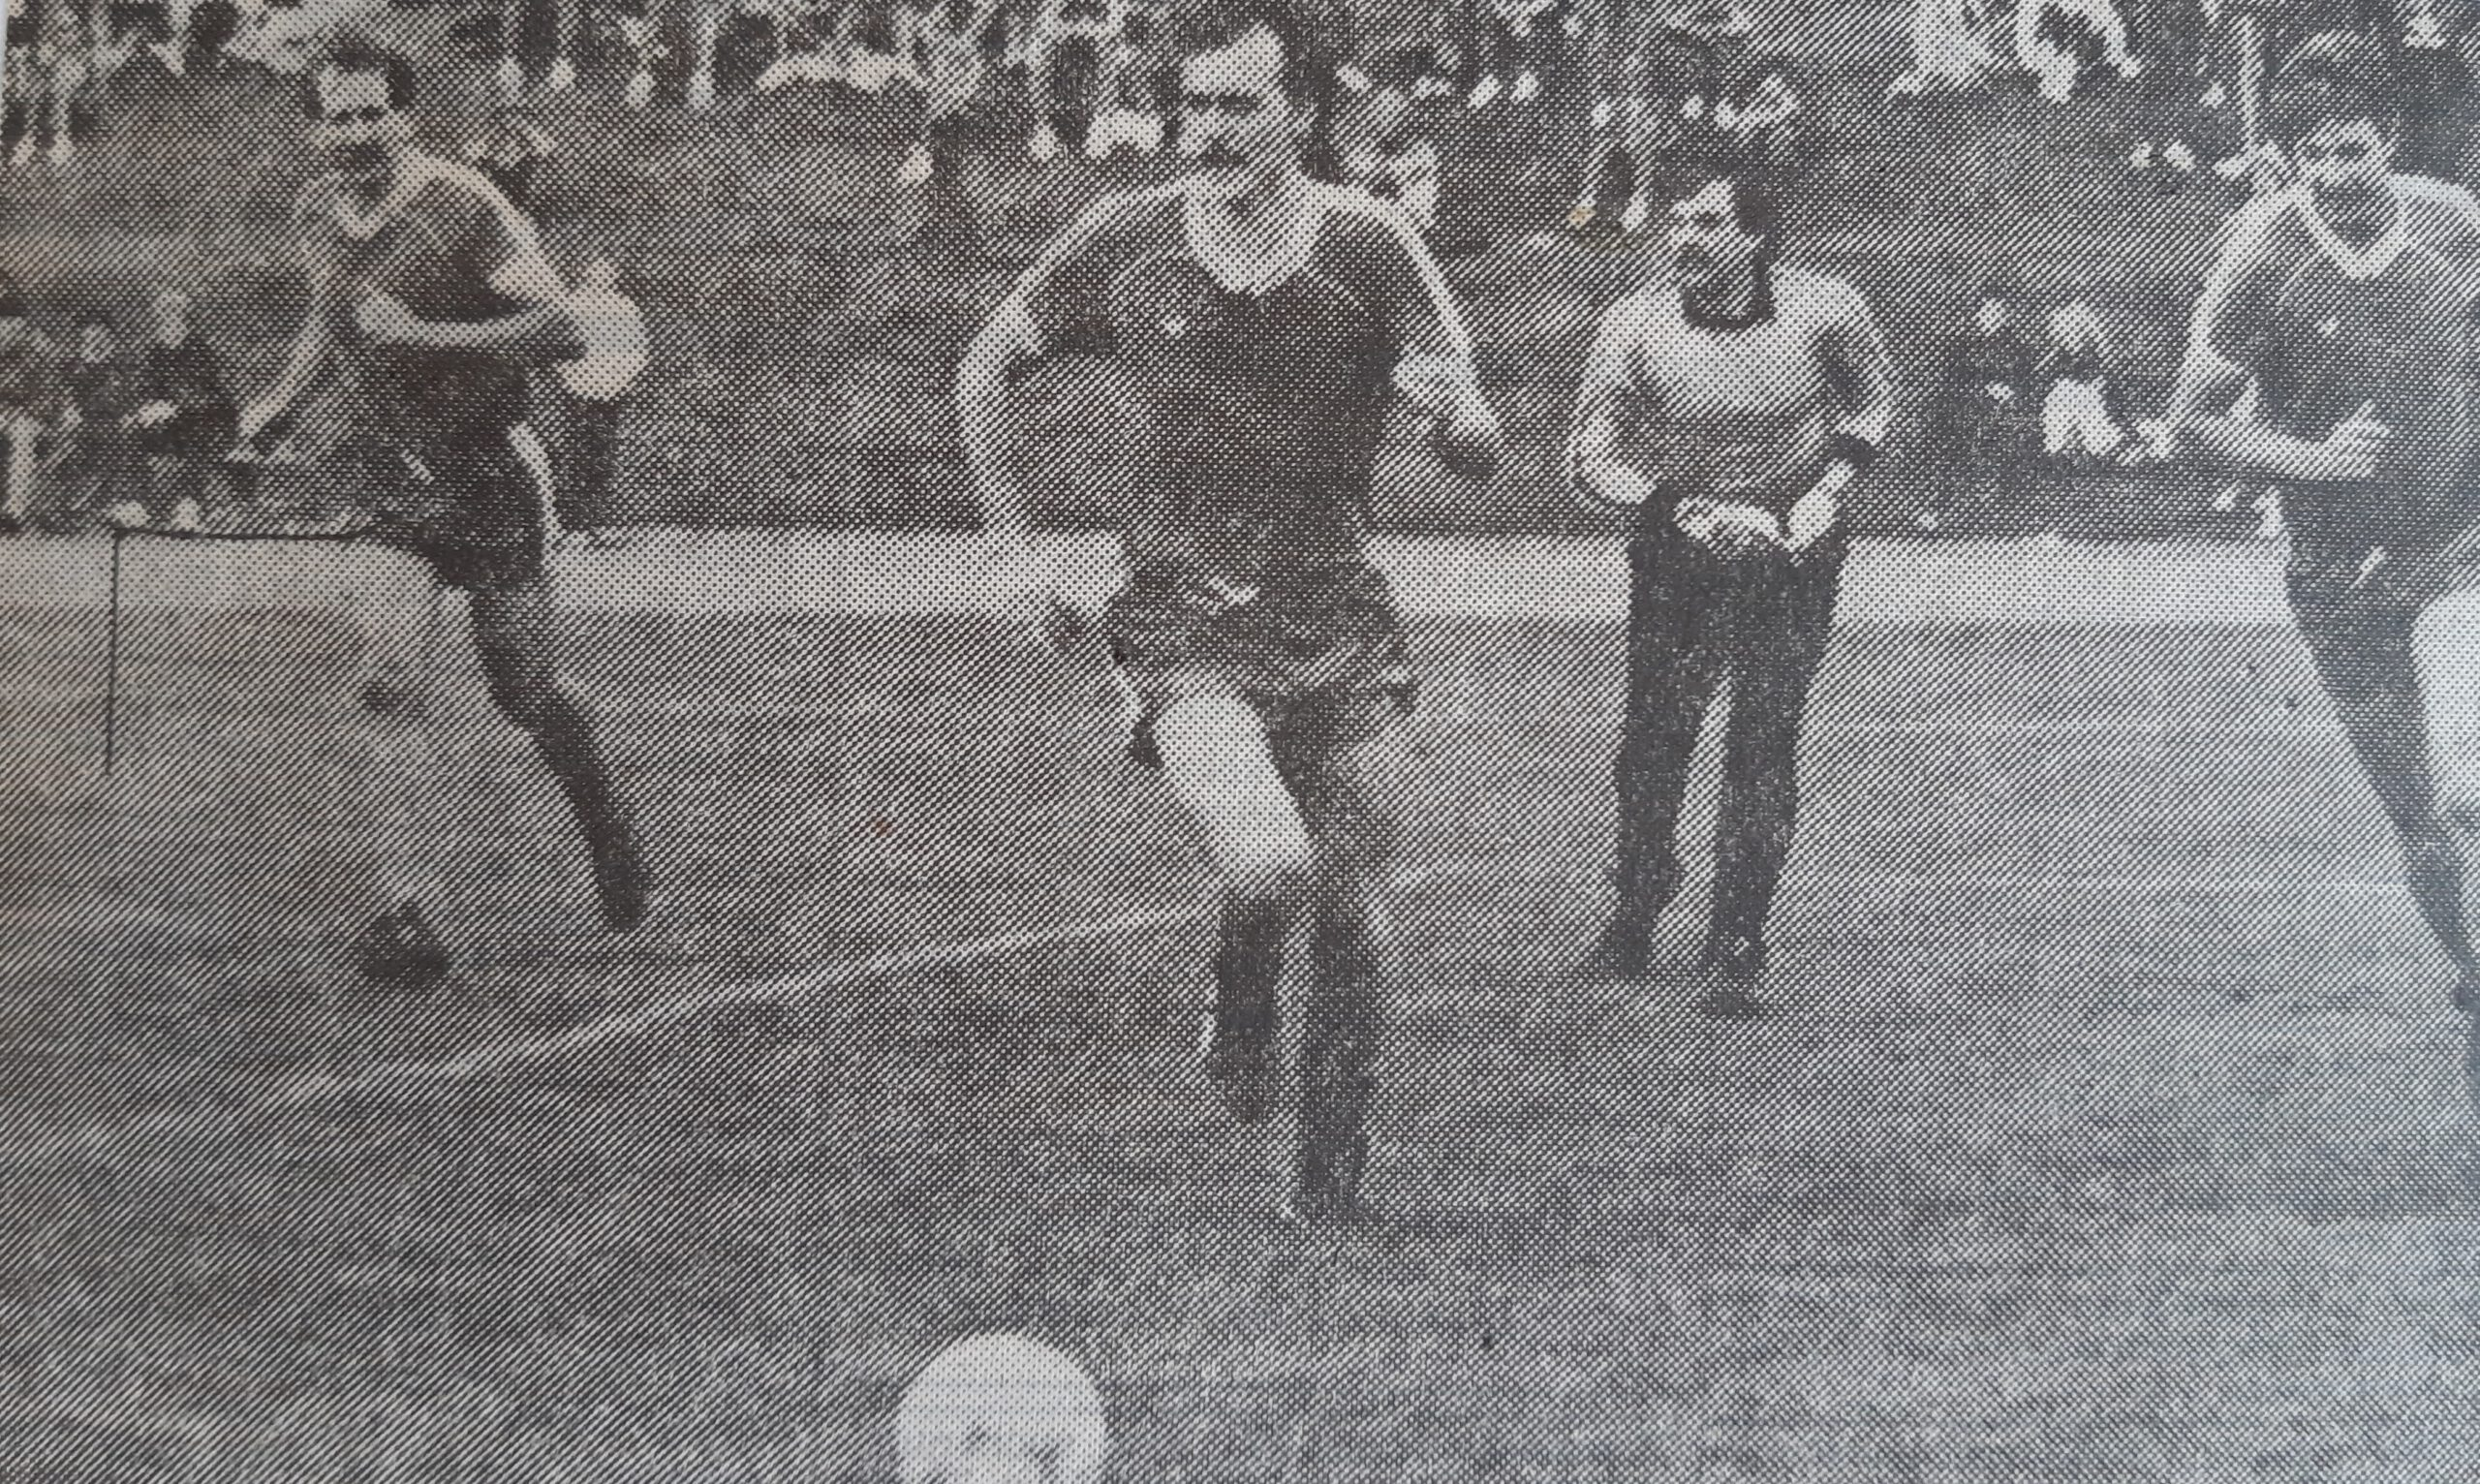 Kreisliga 1984: SV Viktoria Gerblingerode gegen SV Eintracht Gieboldehausen